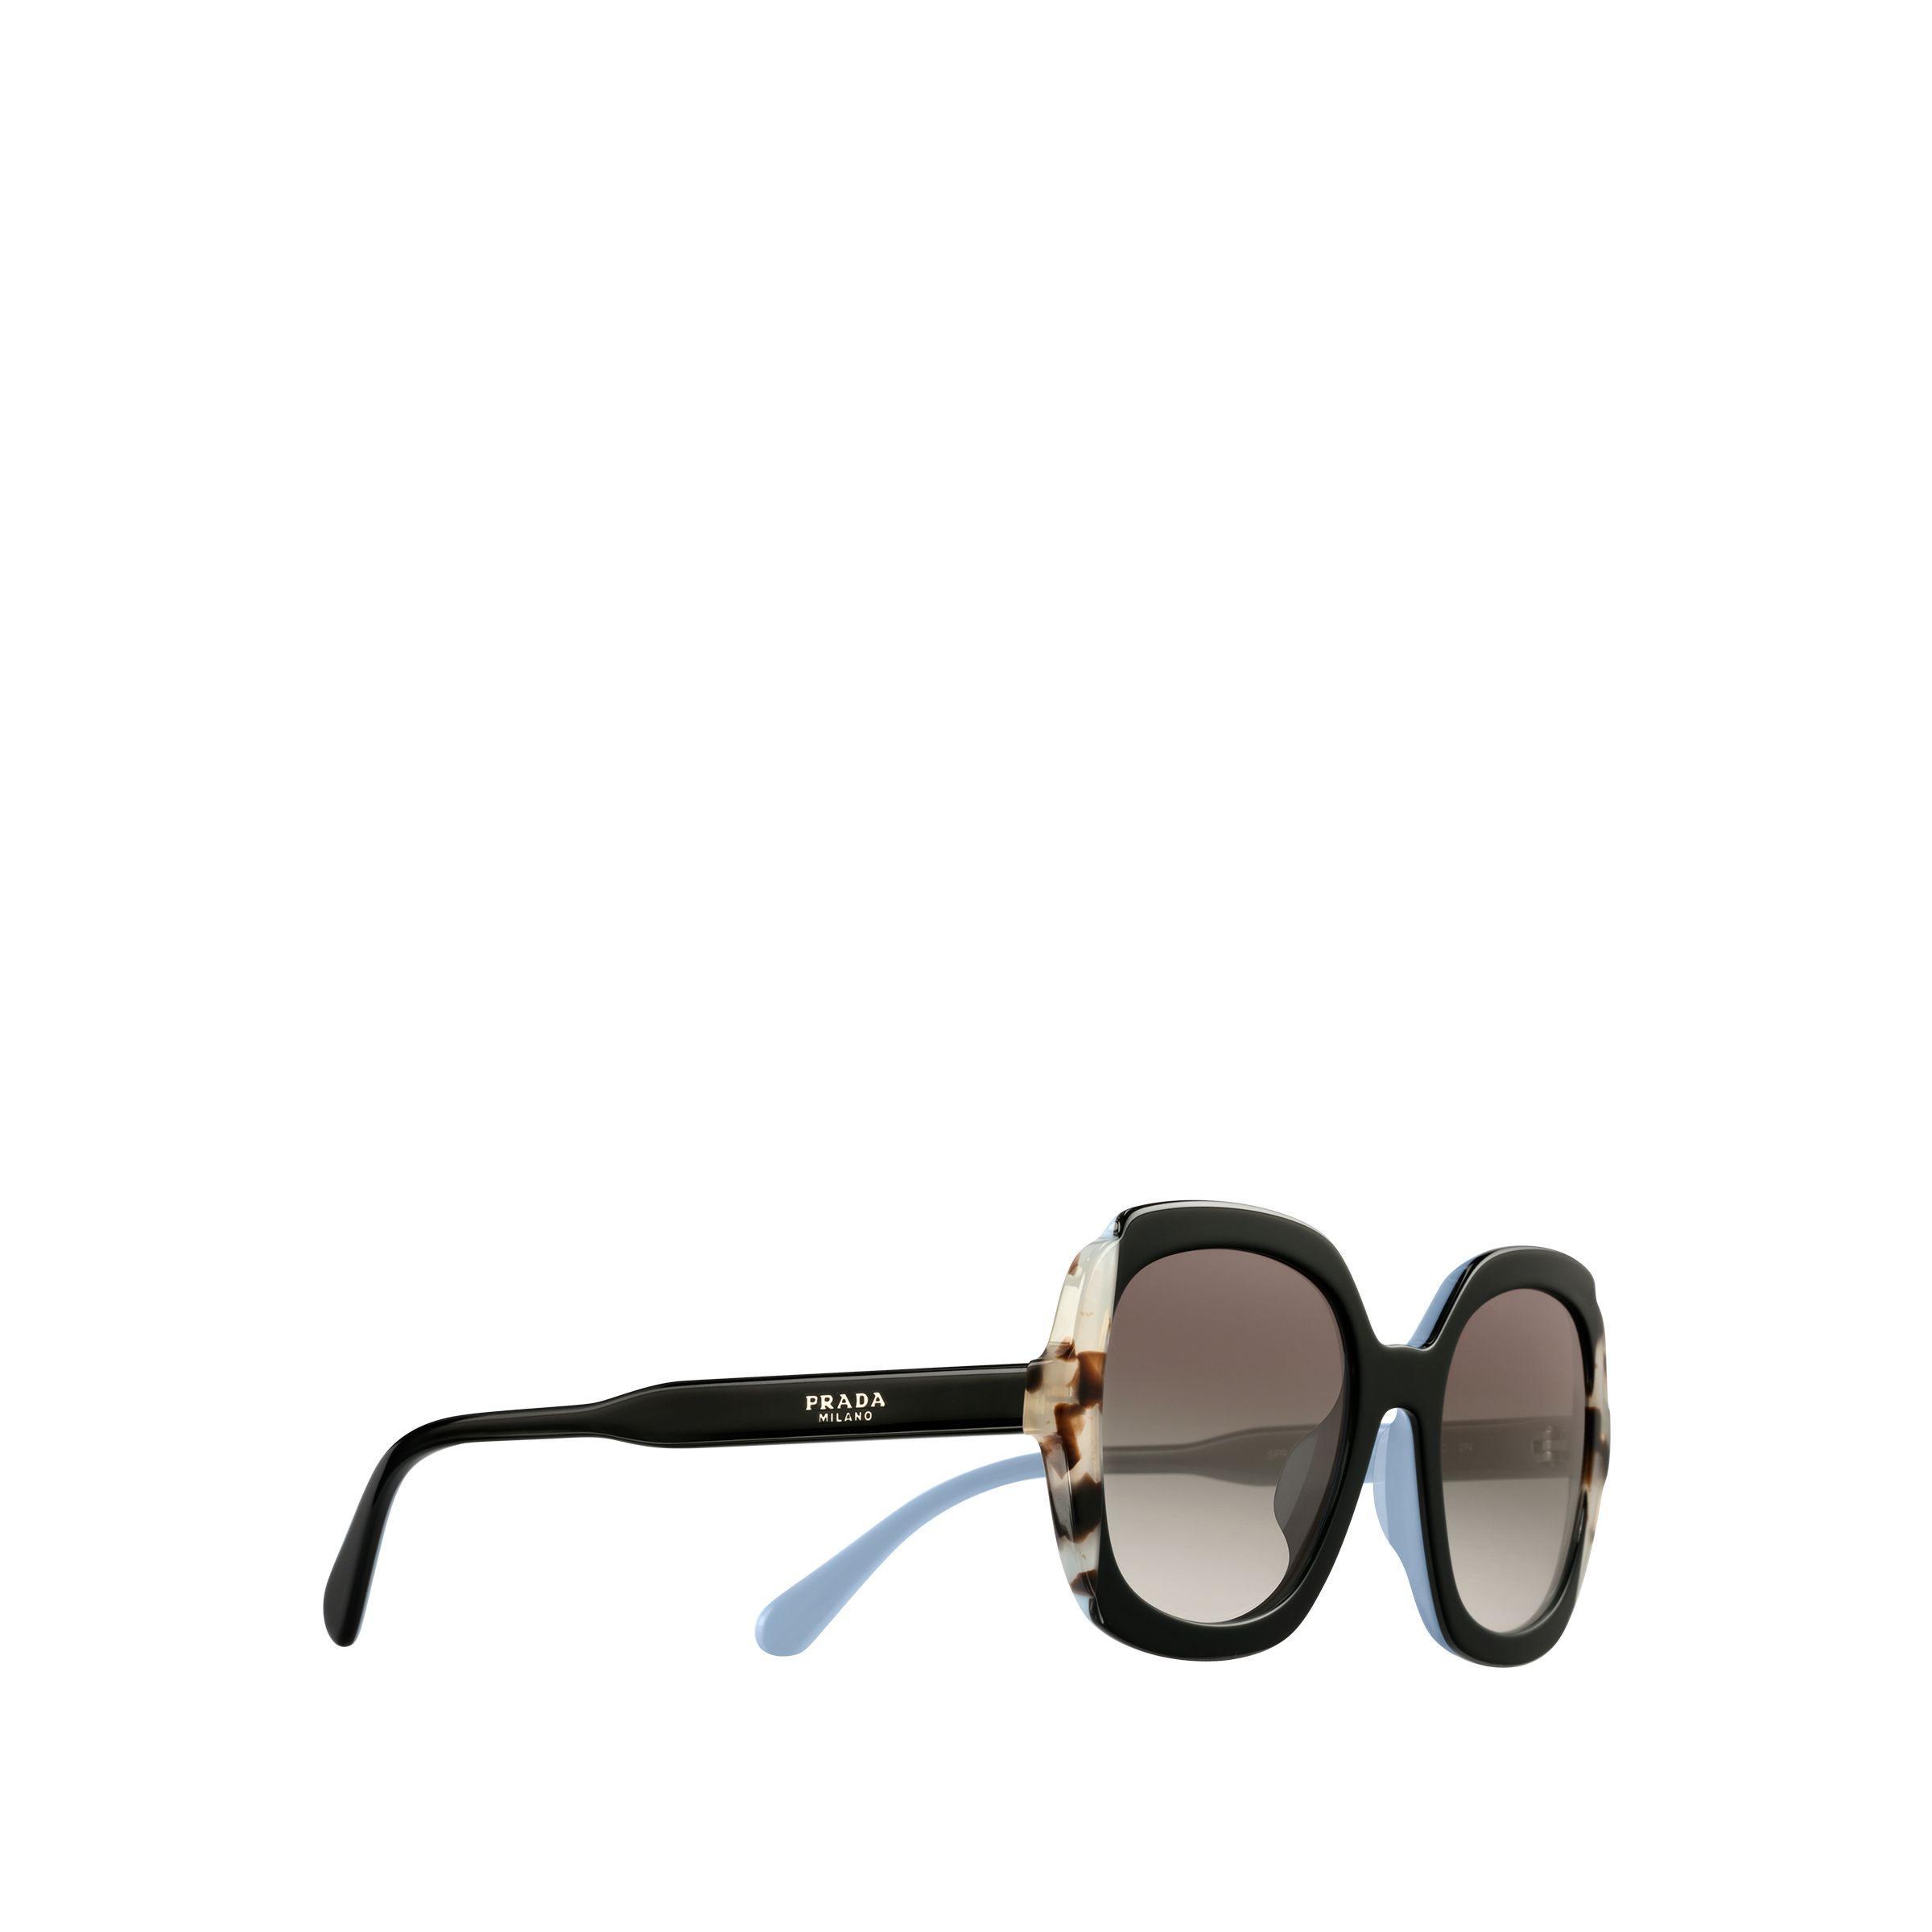 f5c027577 Prada - Multicolor Eyewear Collection Alternative Fit - Lyst. View  fullscreen